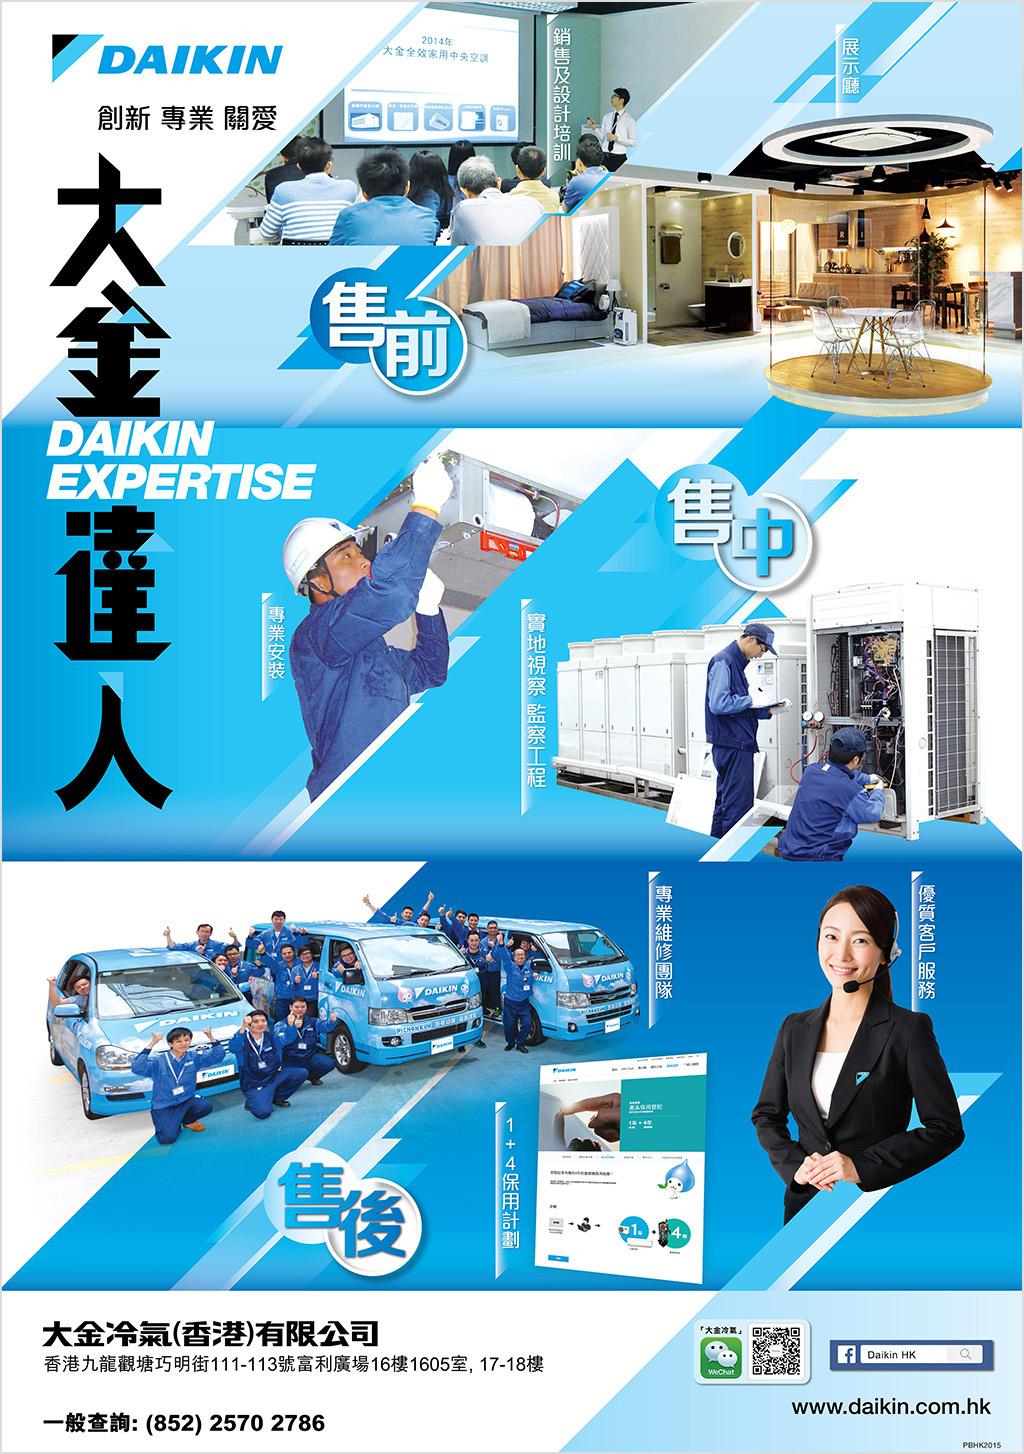 Daikin Air Conditioning (Hong Kong) Poster design